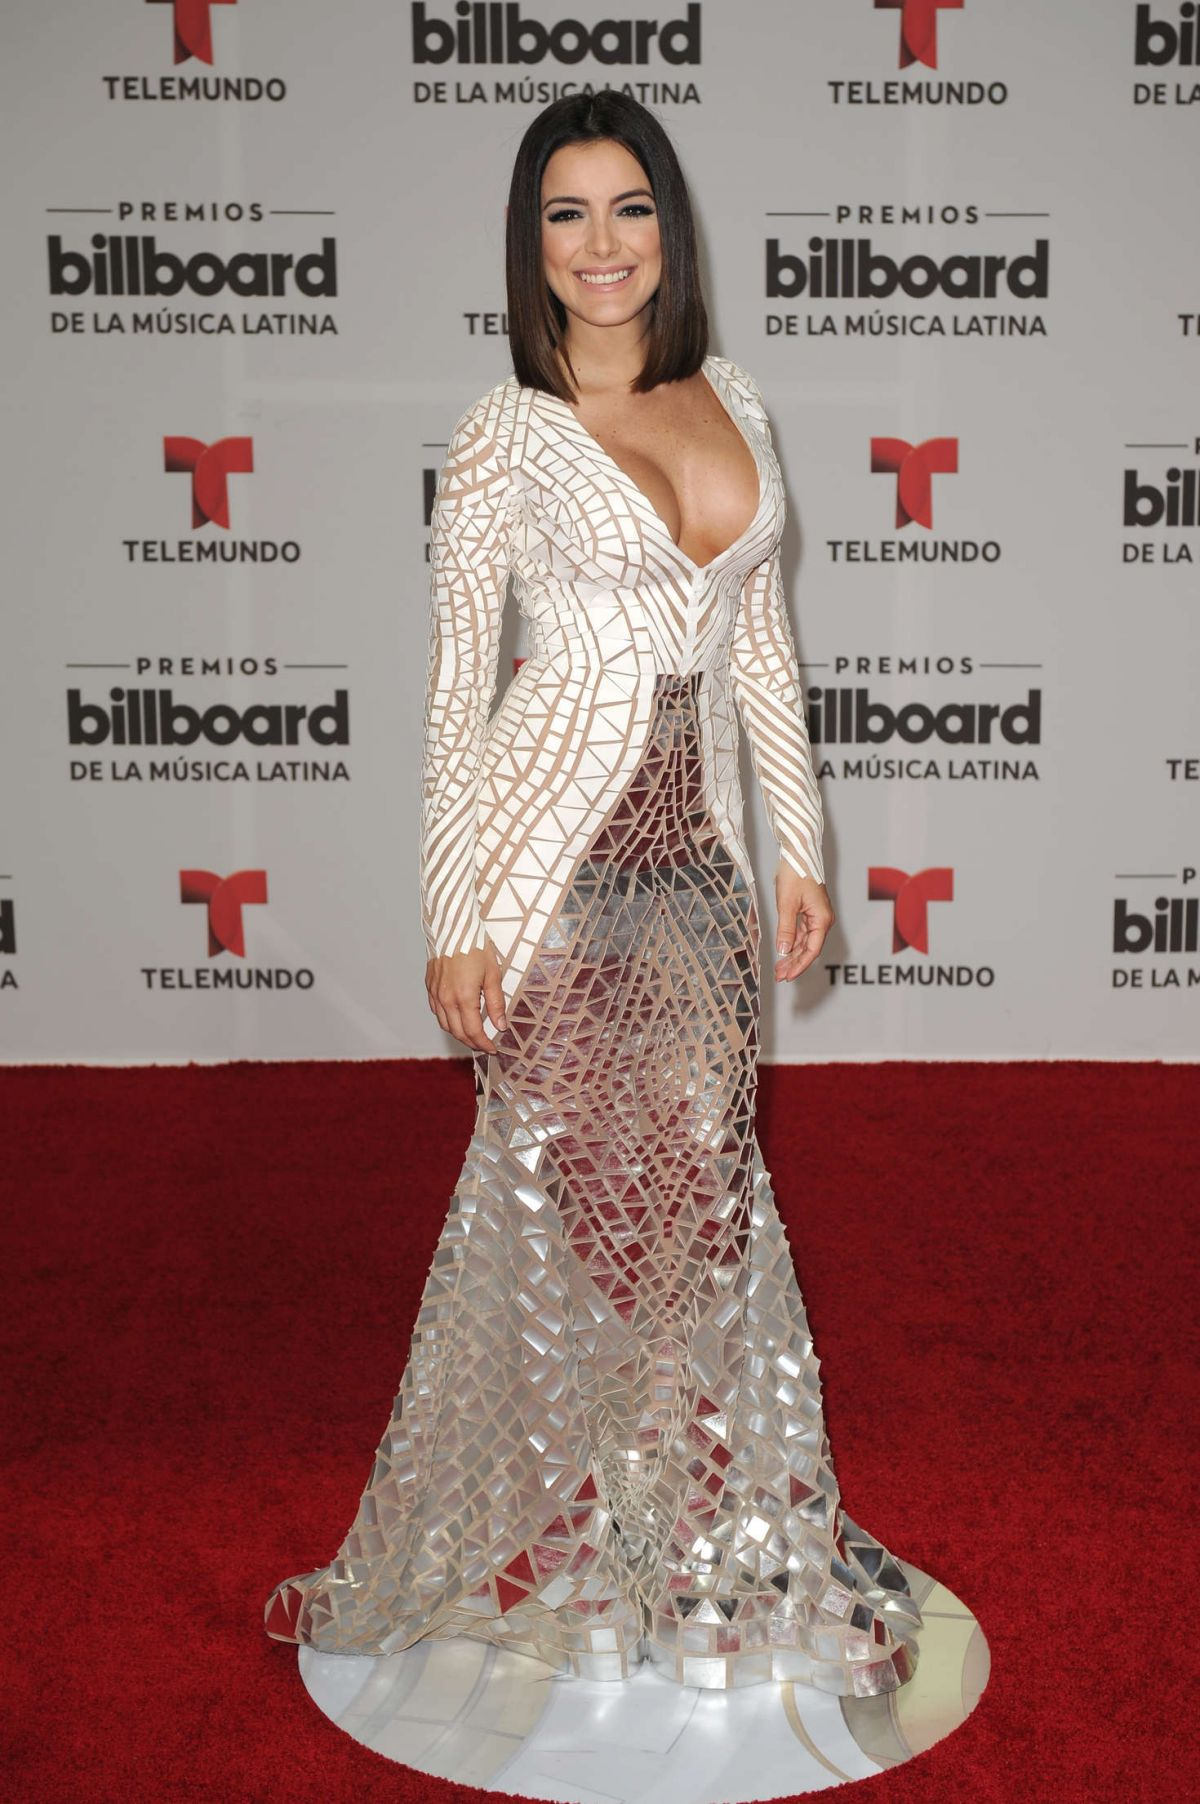 DANIELA NAVARRO at Billboard Latin Music Awards in Miami 04/28/2016